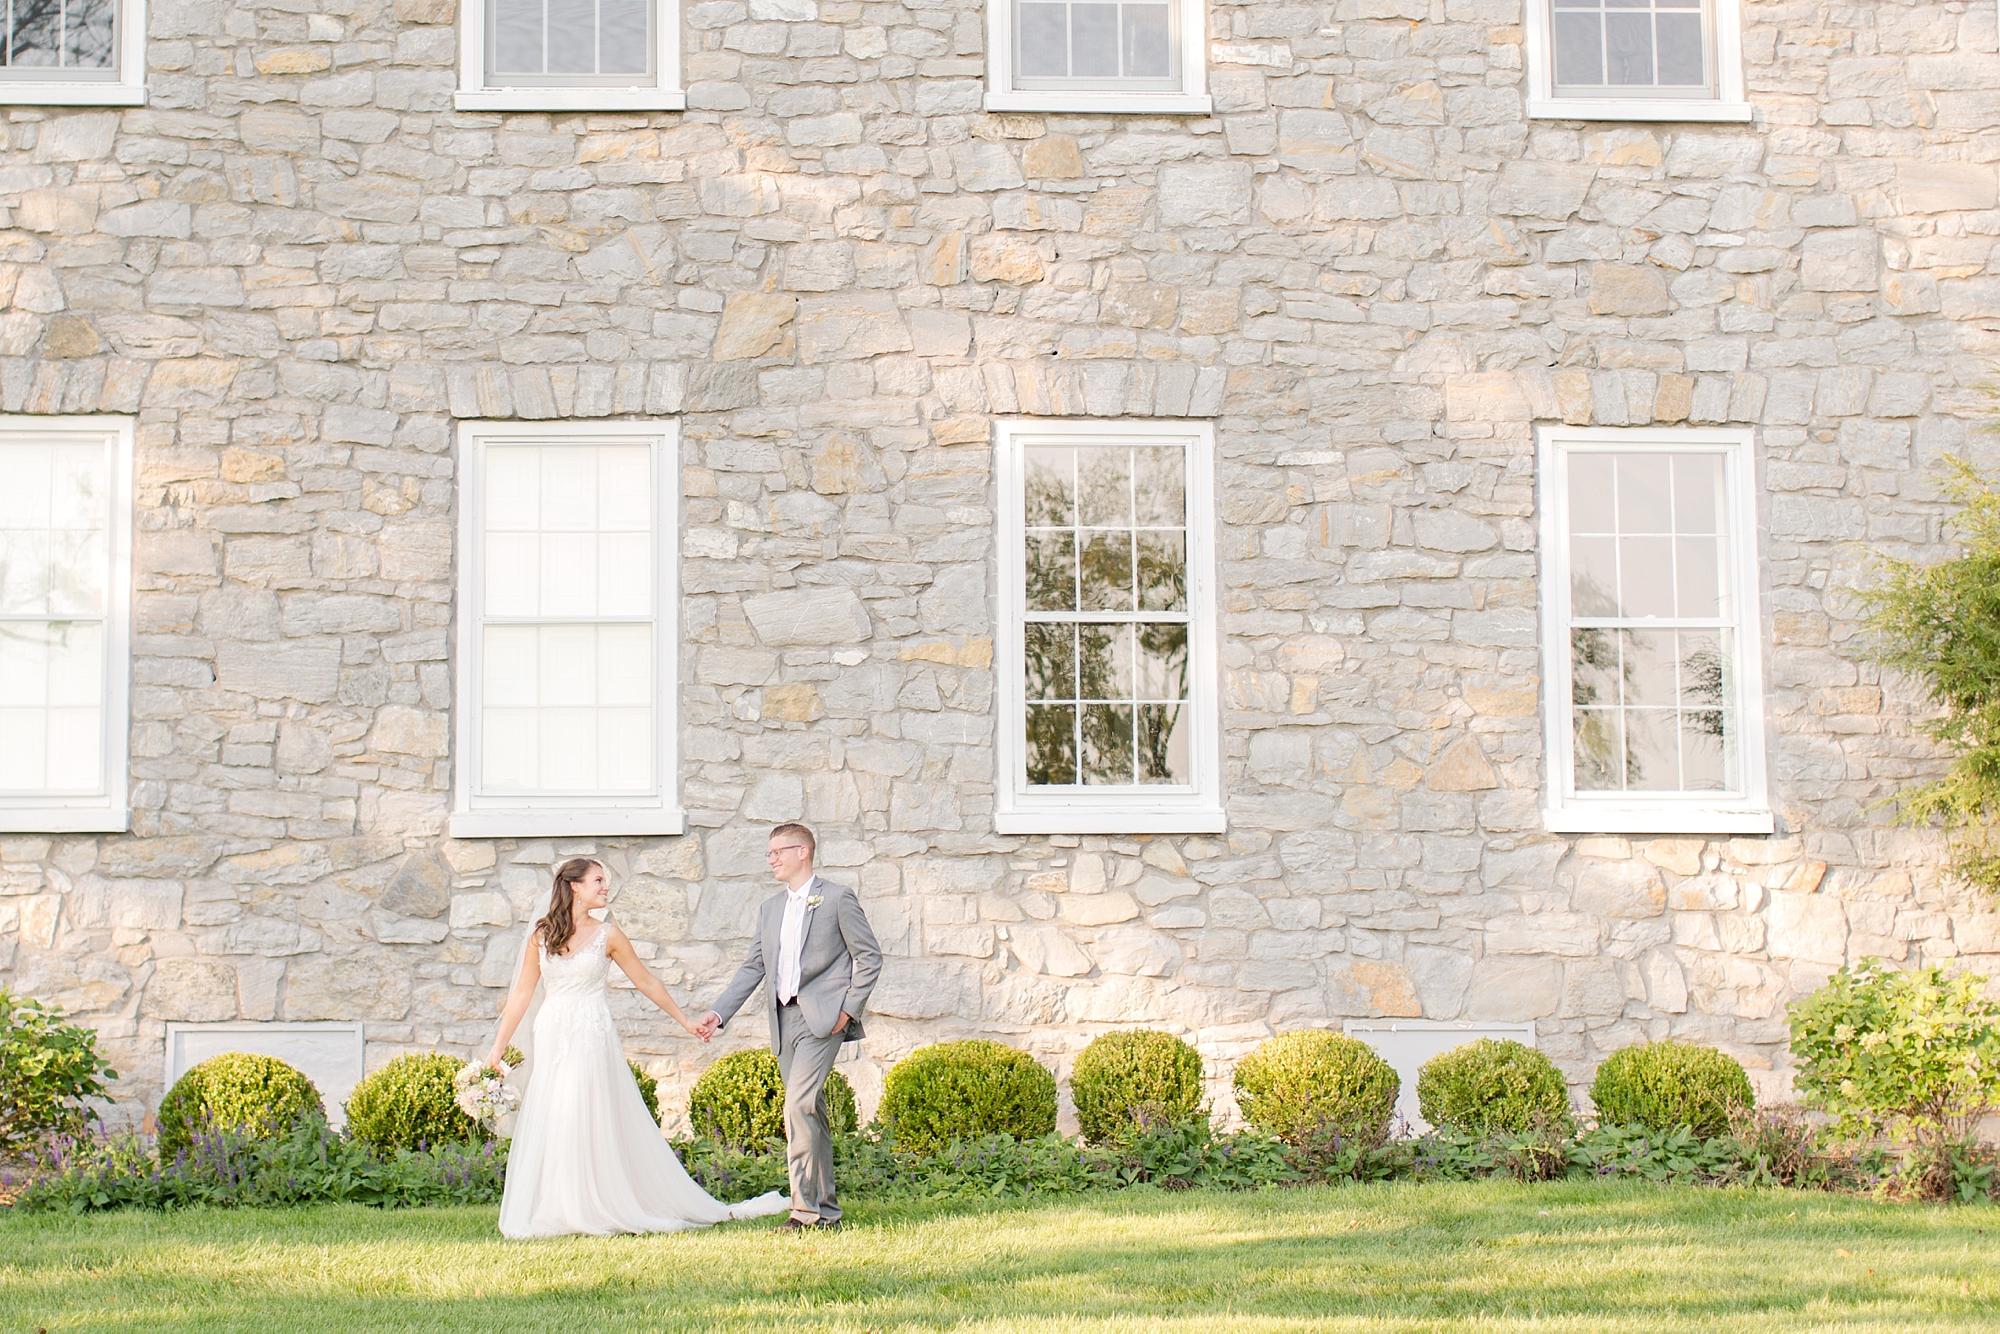 Tomaszewski 3-Bride & Groom-1089_anna grace photography baltimore maryland wedding photographer rockland estates wedding photo.jpg